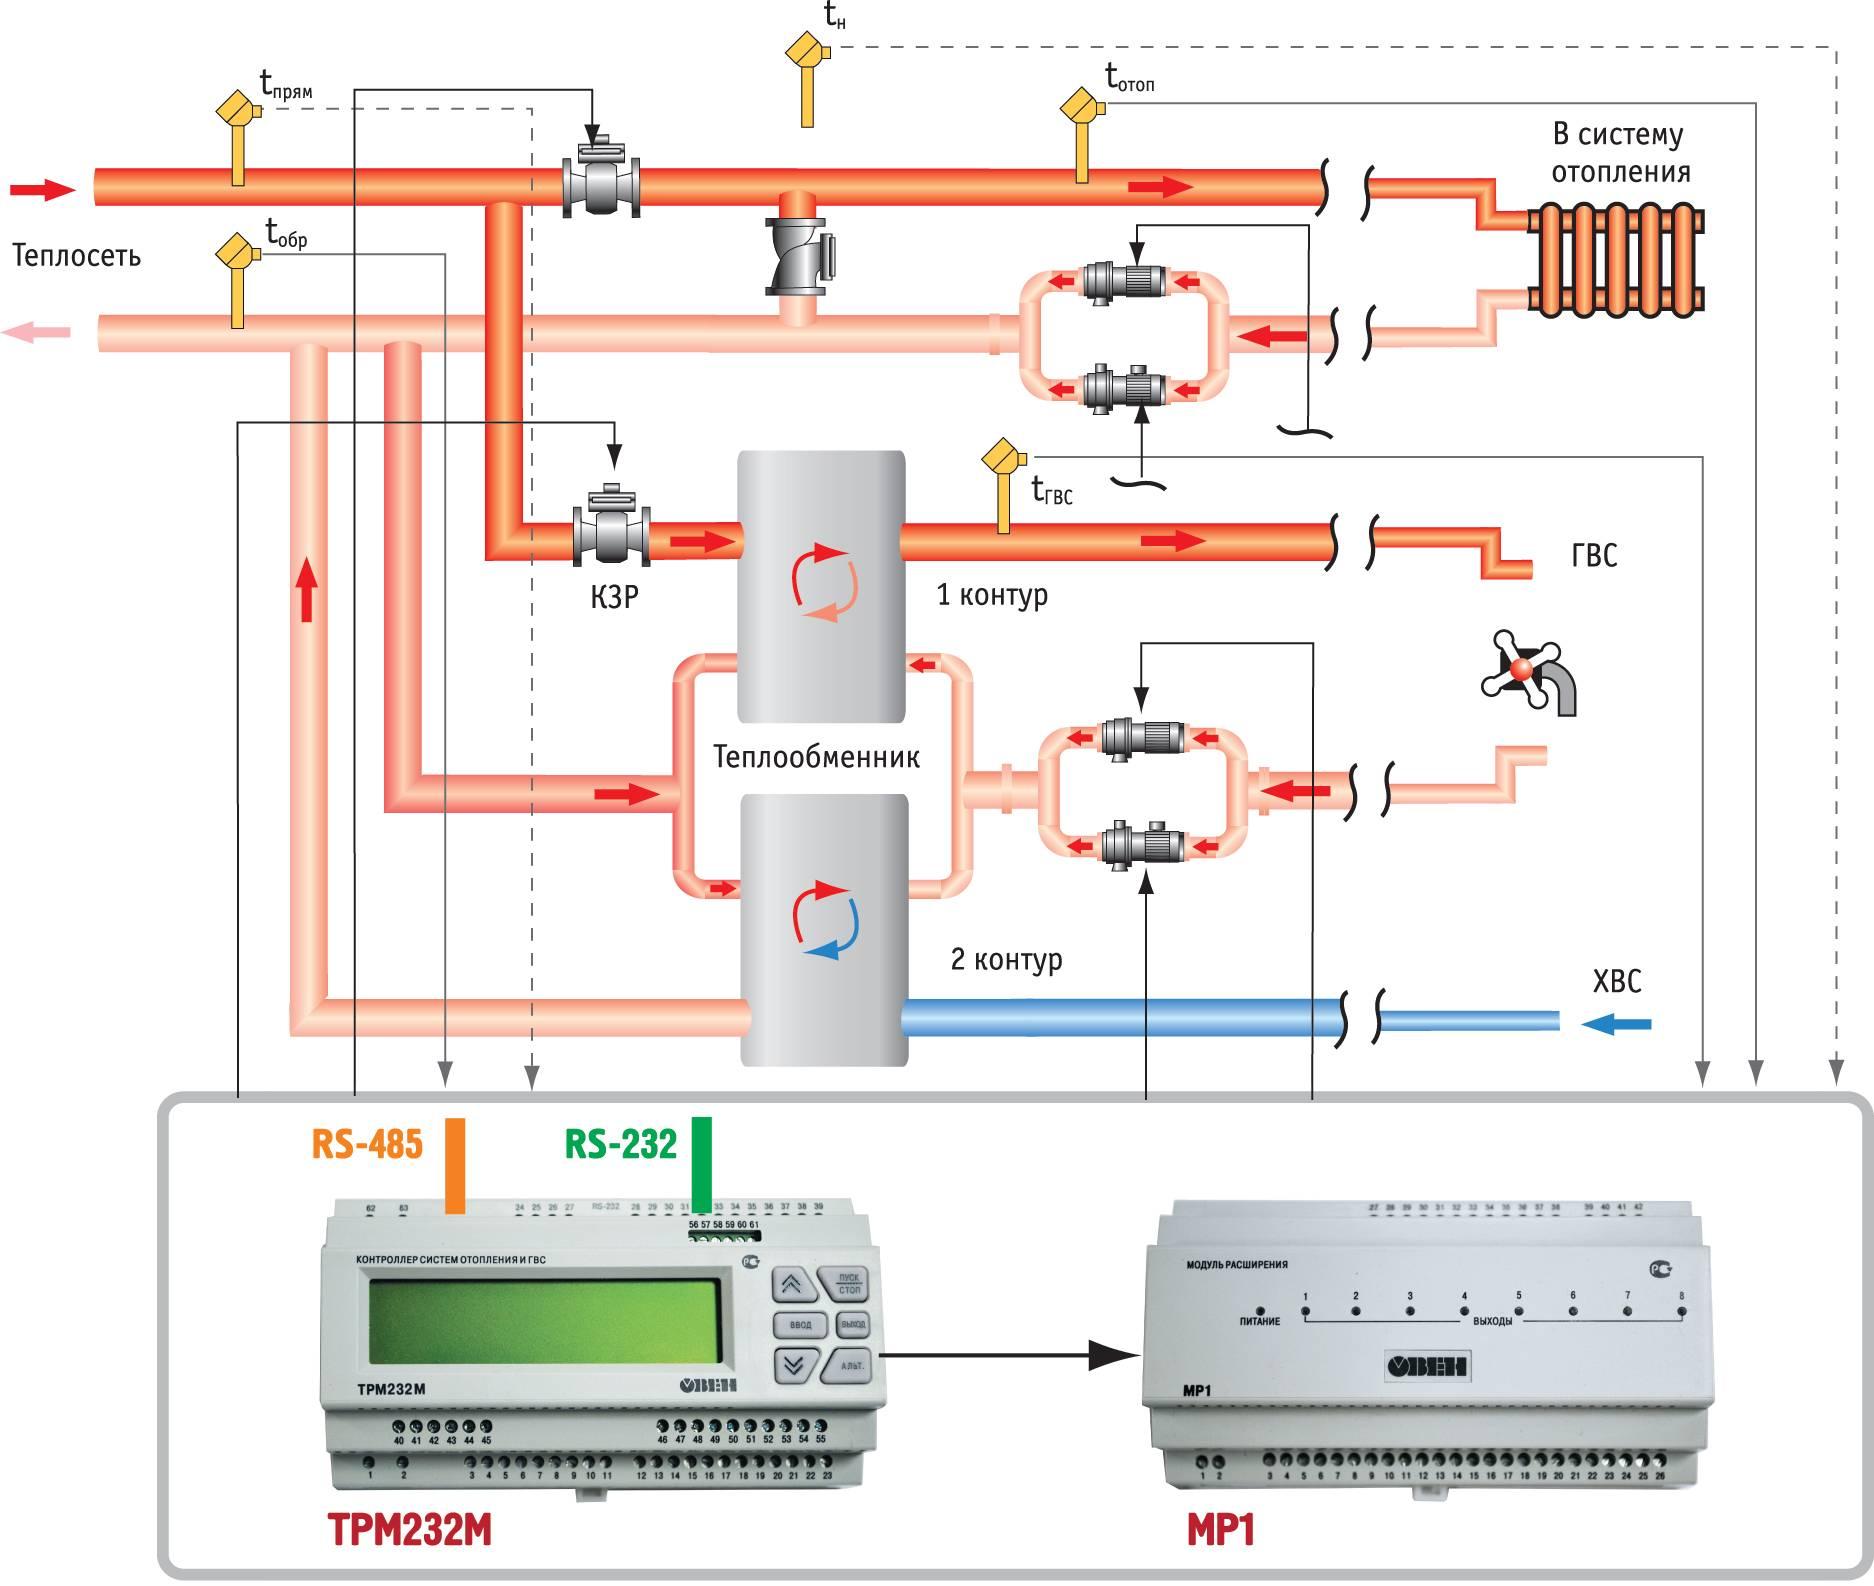 Автоматика систем отопления: видео-инструкция по монтажу своими руками, особенности автоматизации, автоматического управления, цена, фото